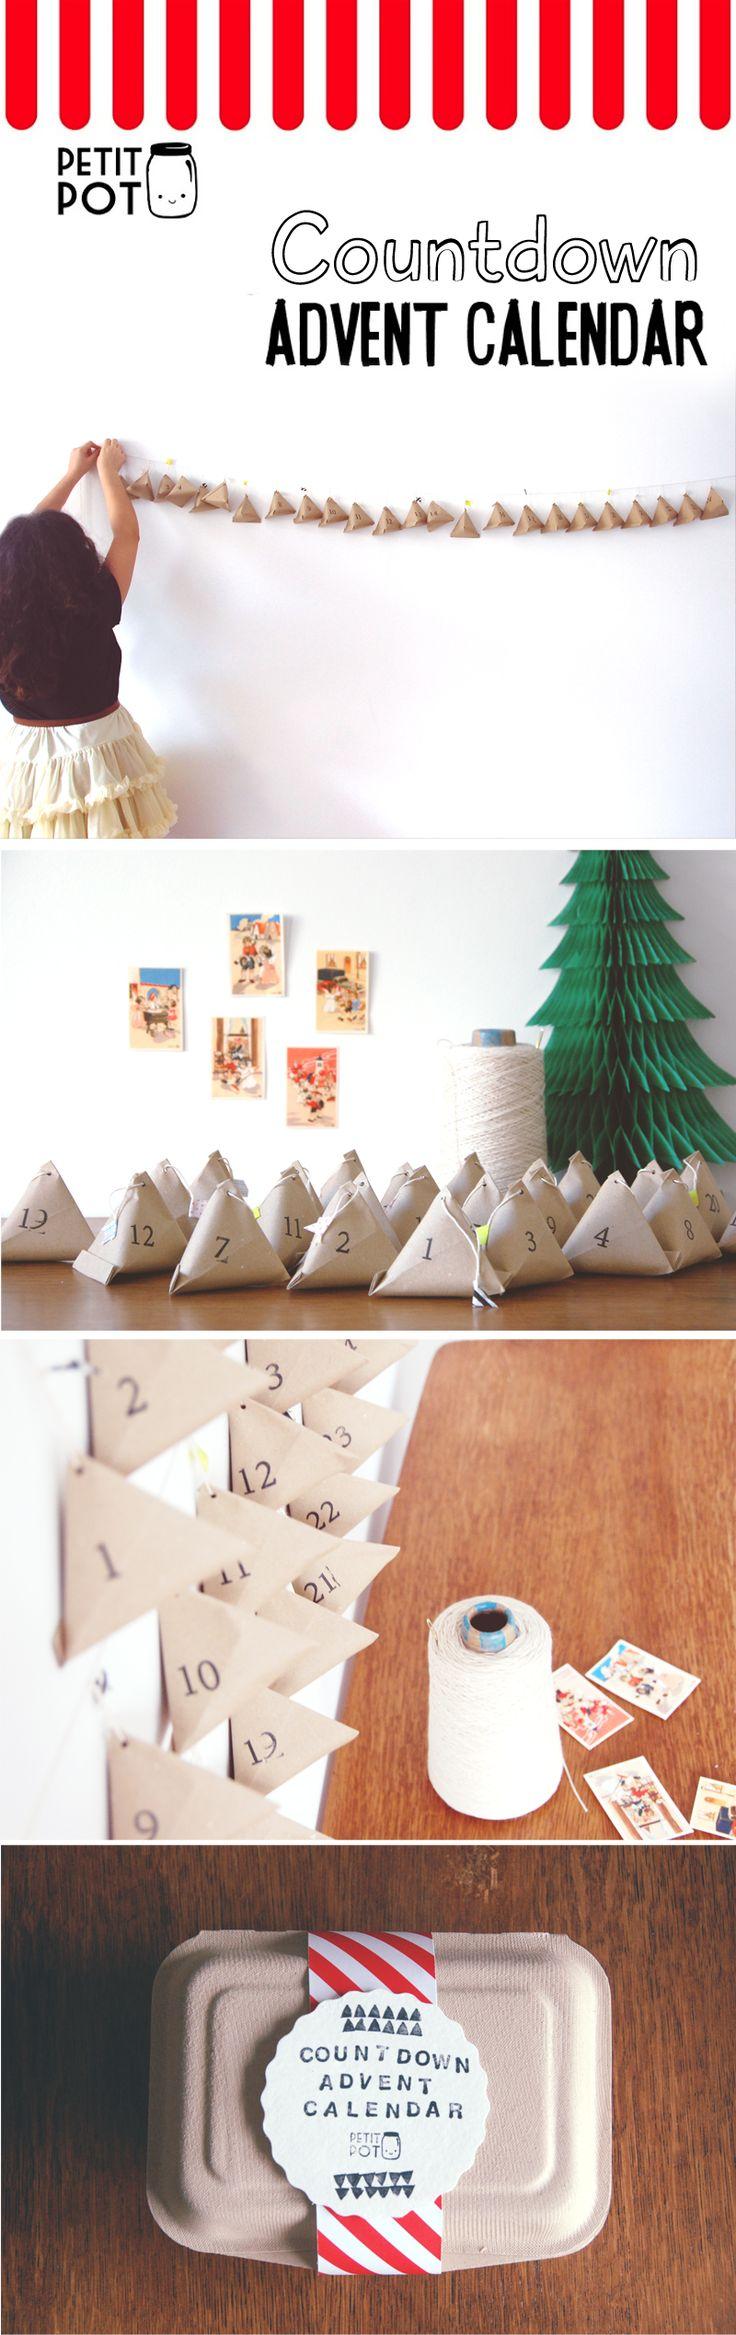 ♥ Le Petit Pot's amazing new advent calendar